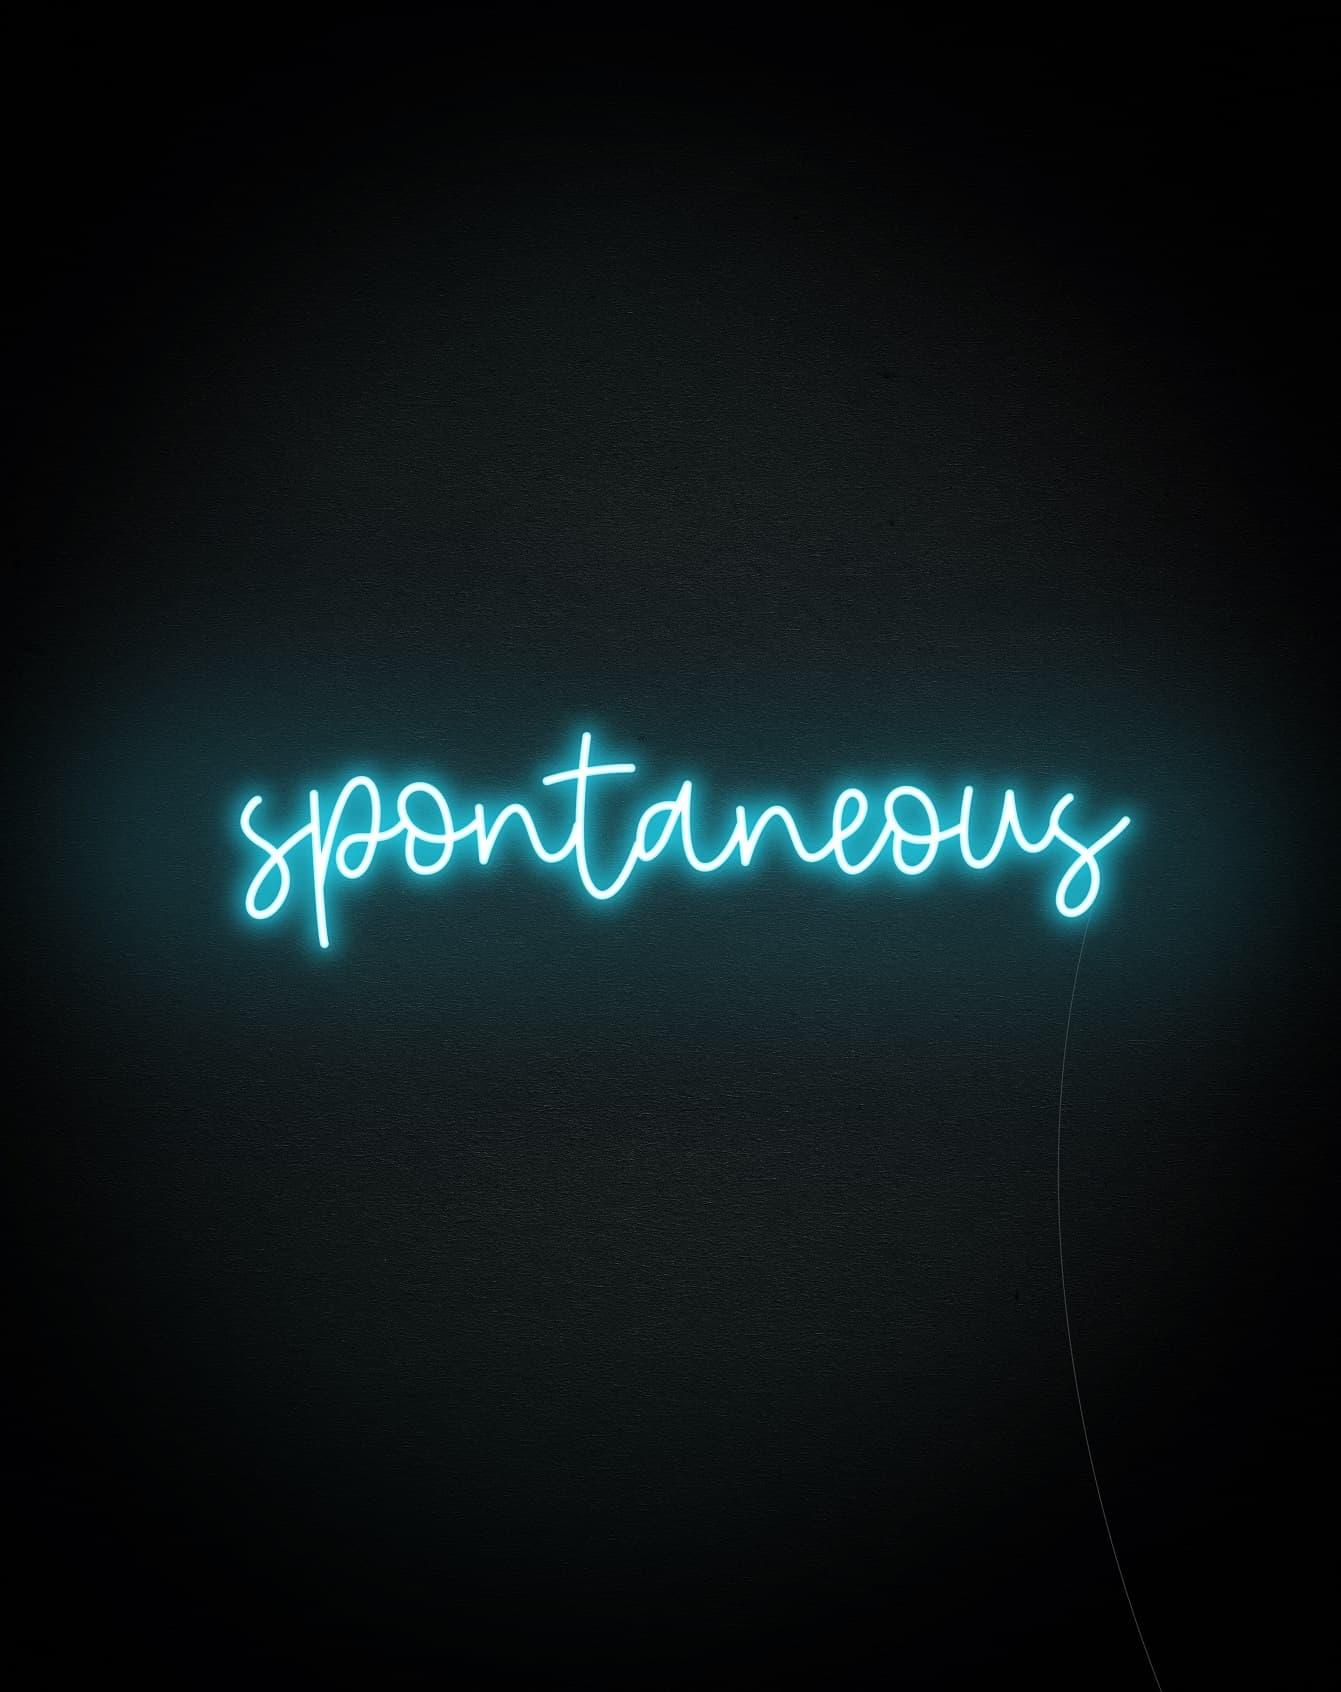 spontaneous neon light